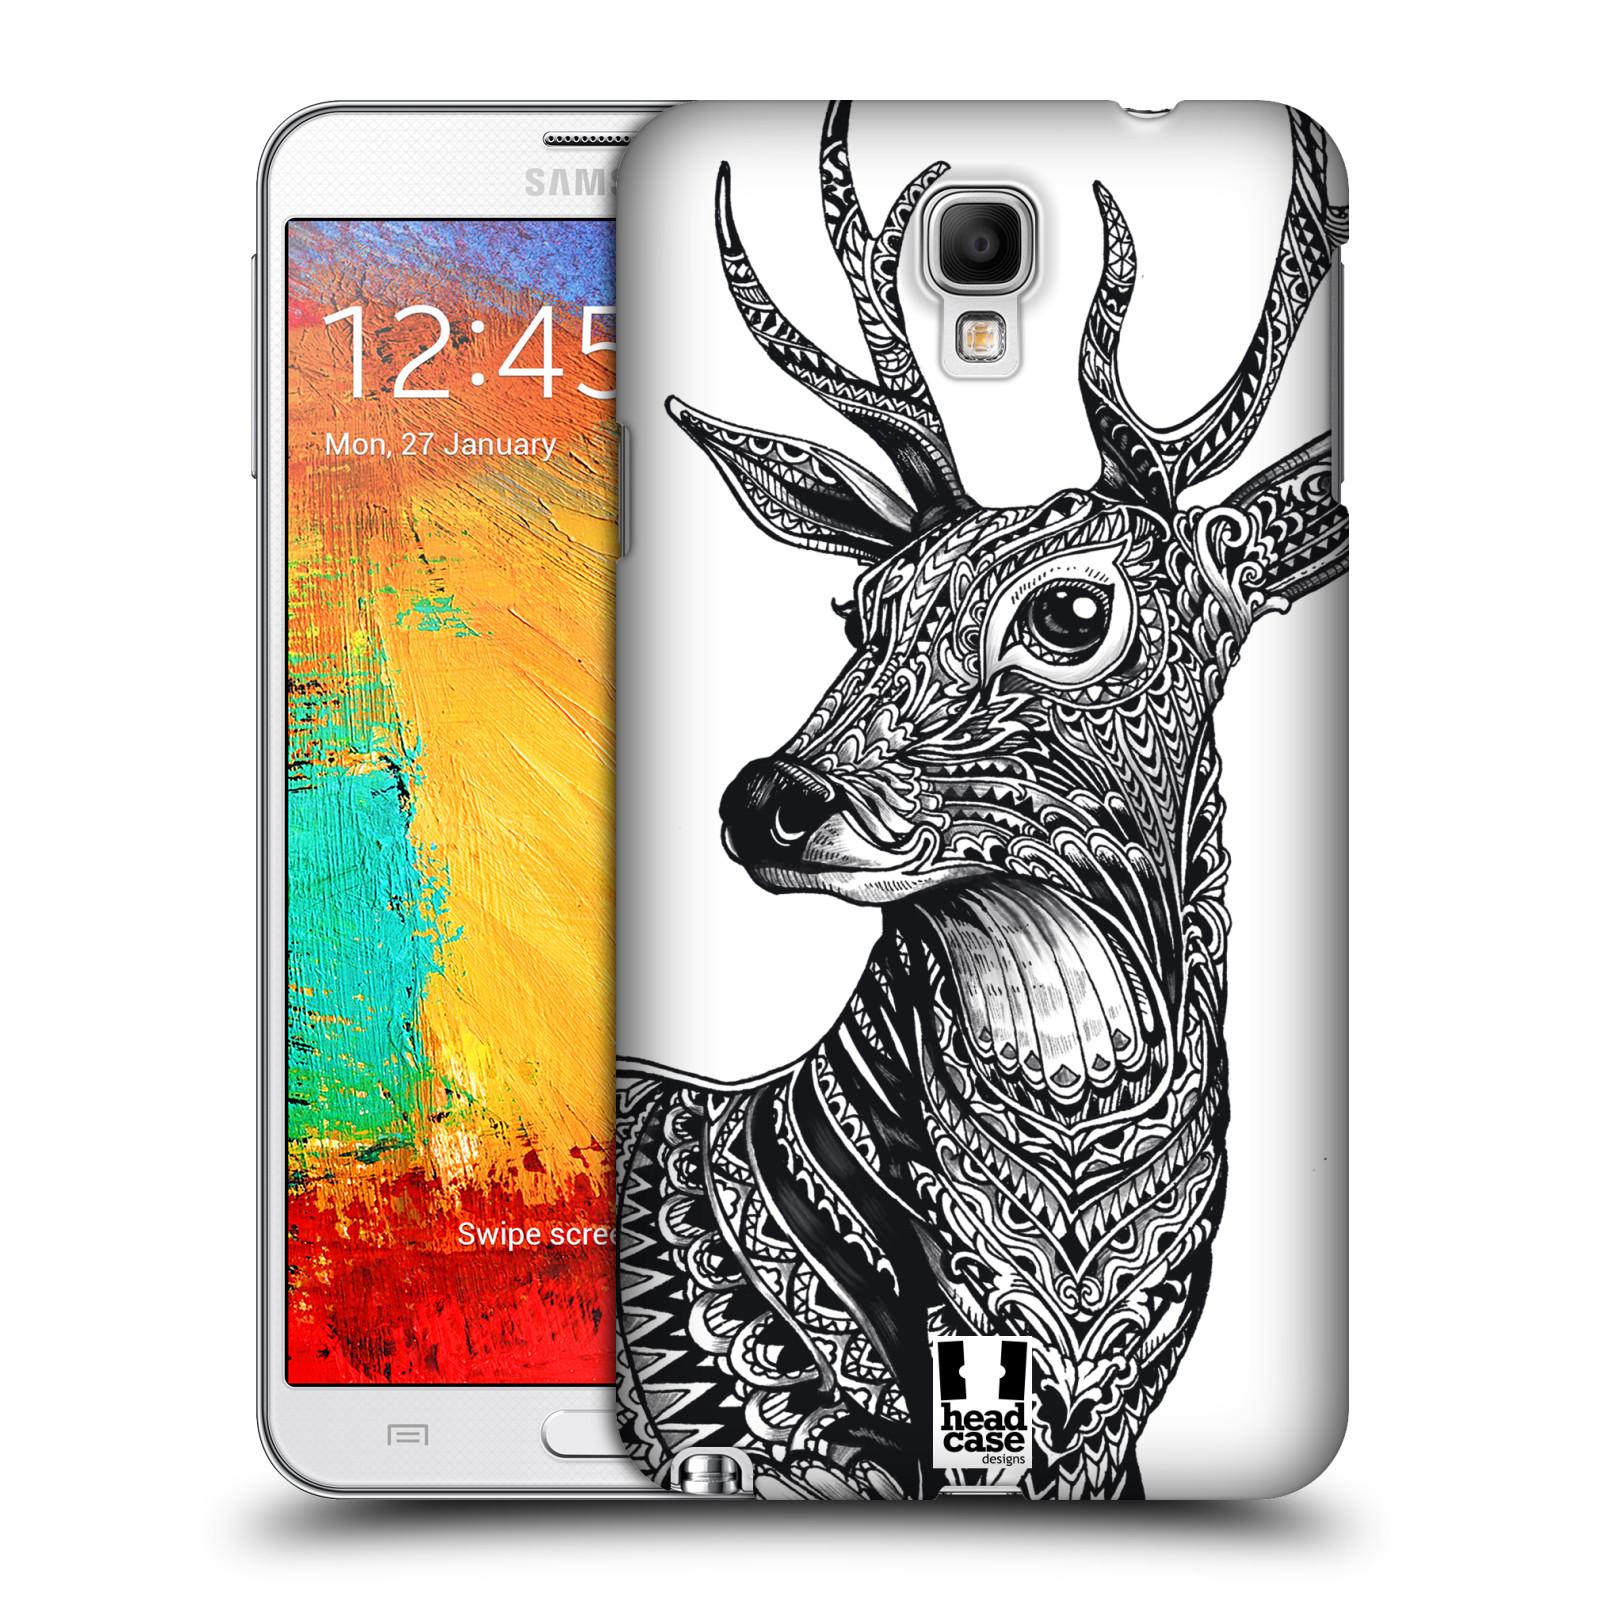 Plastové pouzdro na mobil Samsung Galaxy Note 3 Neo HEAD CASE Zdobený Jelínek (Plastový kryt či obal na mobilní telefon Samsung Galaxy Note 3 Neo SM-N7505)